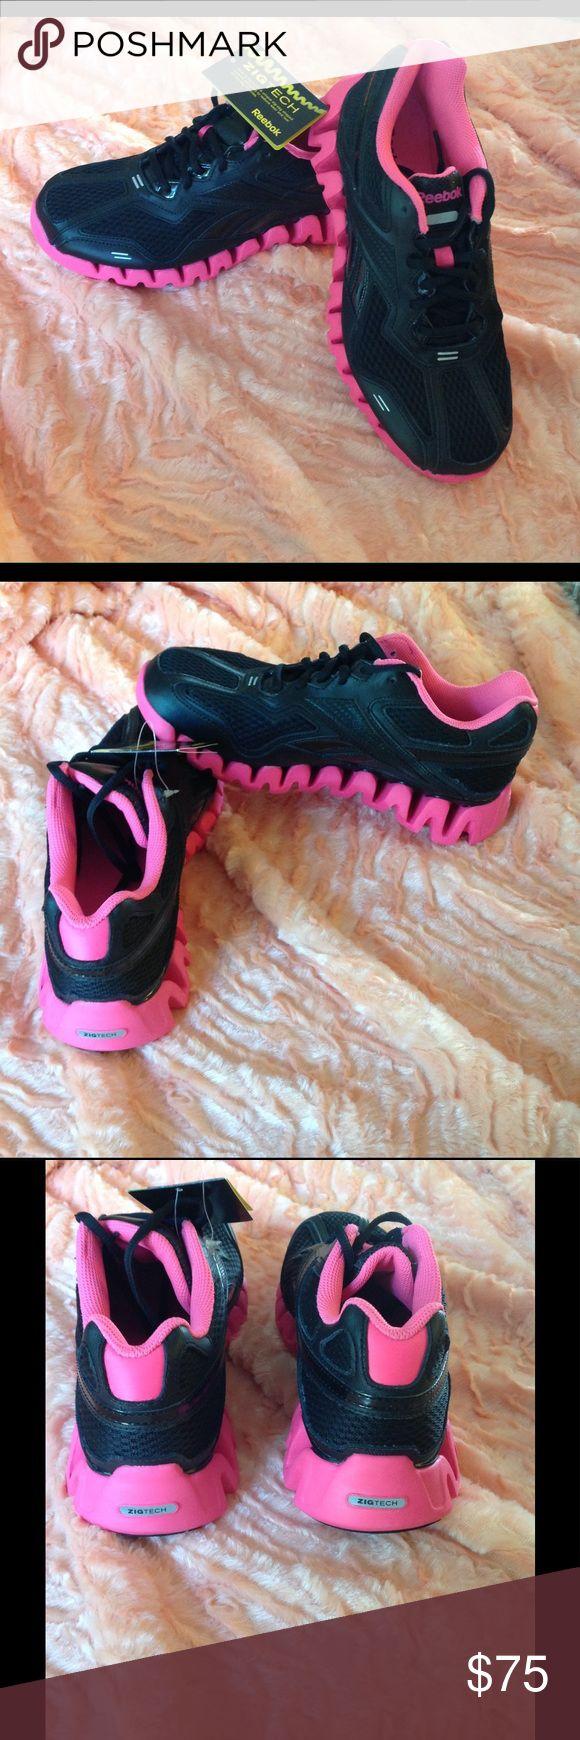 New Reebok Zig Tech Zigenergy Black/Pink  Sz 5.5 New Reebok Running Sneakers Sz 5.5 Reebok Shoes Athletic Shoes